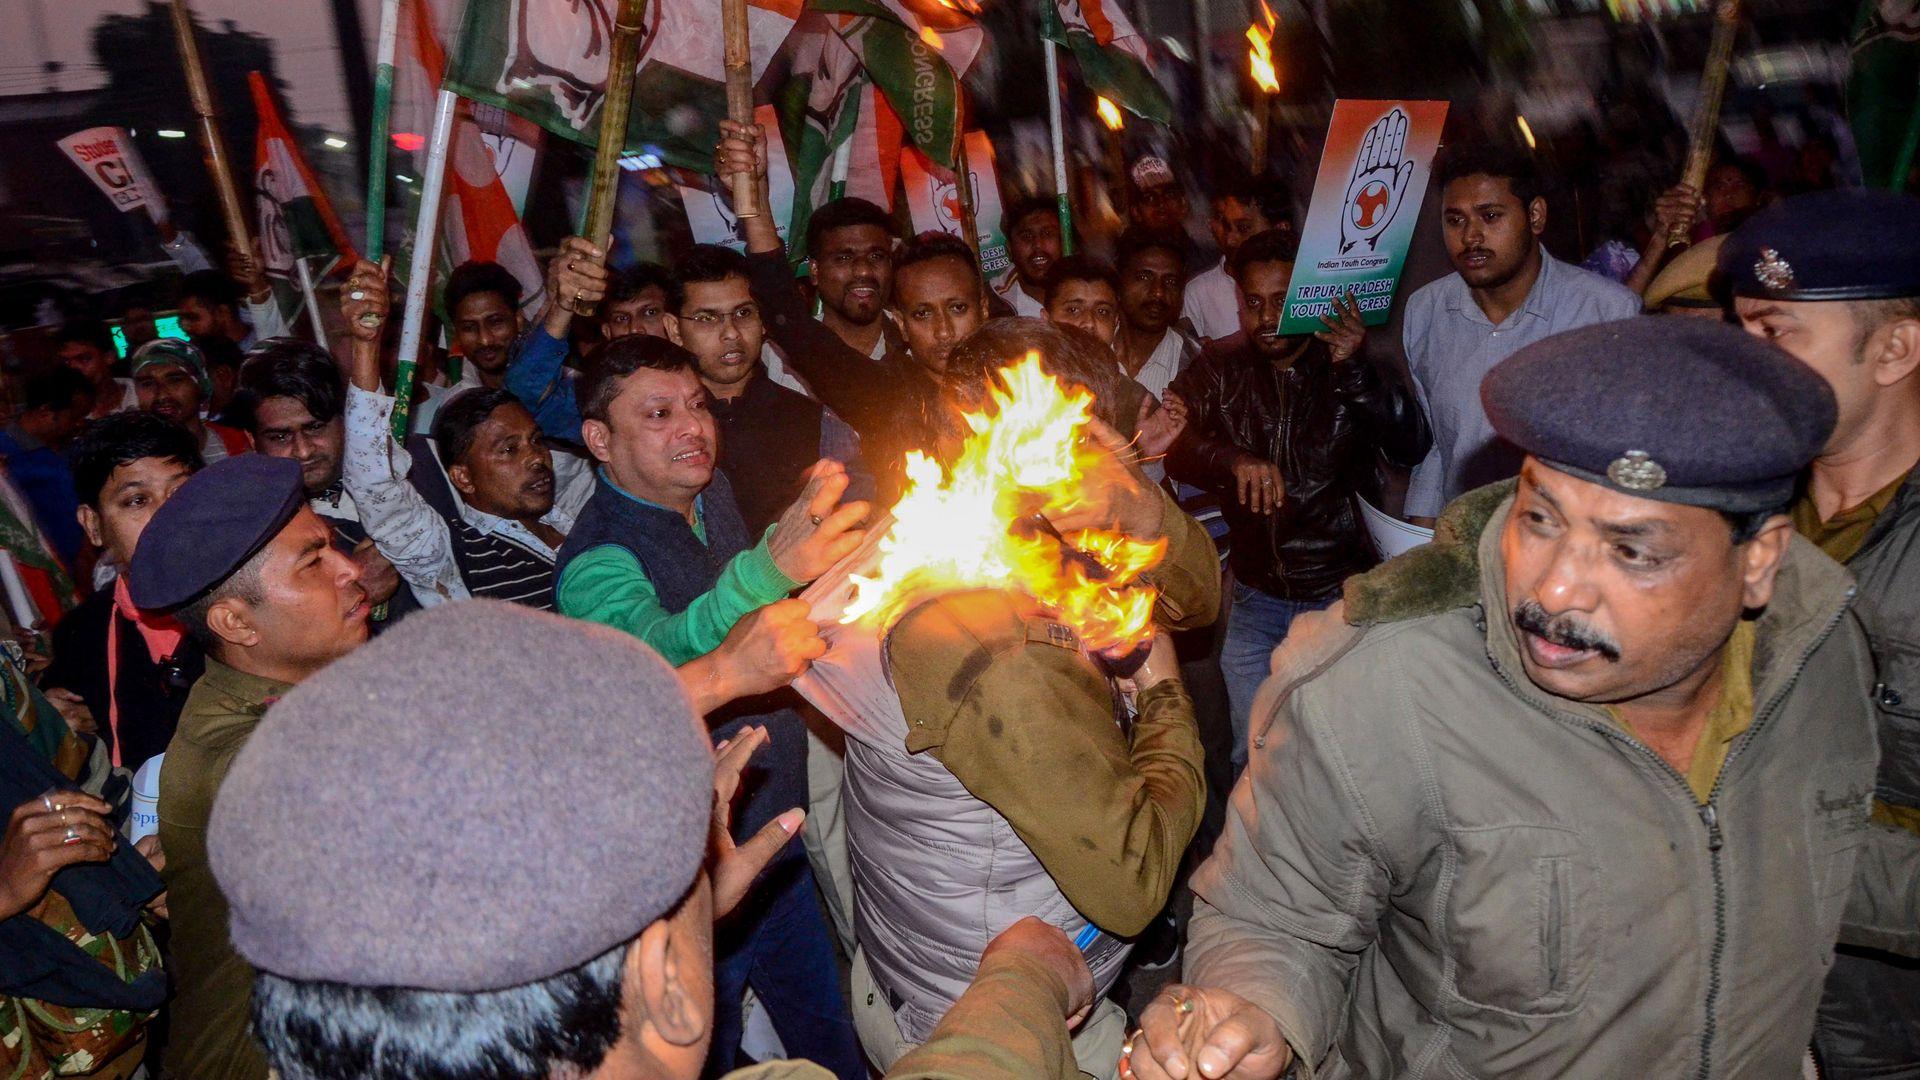 Protests against India's citizenship amendment law